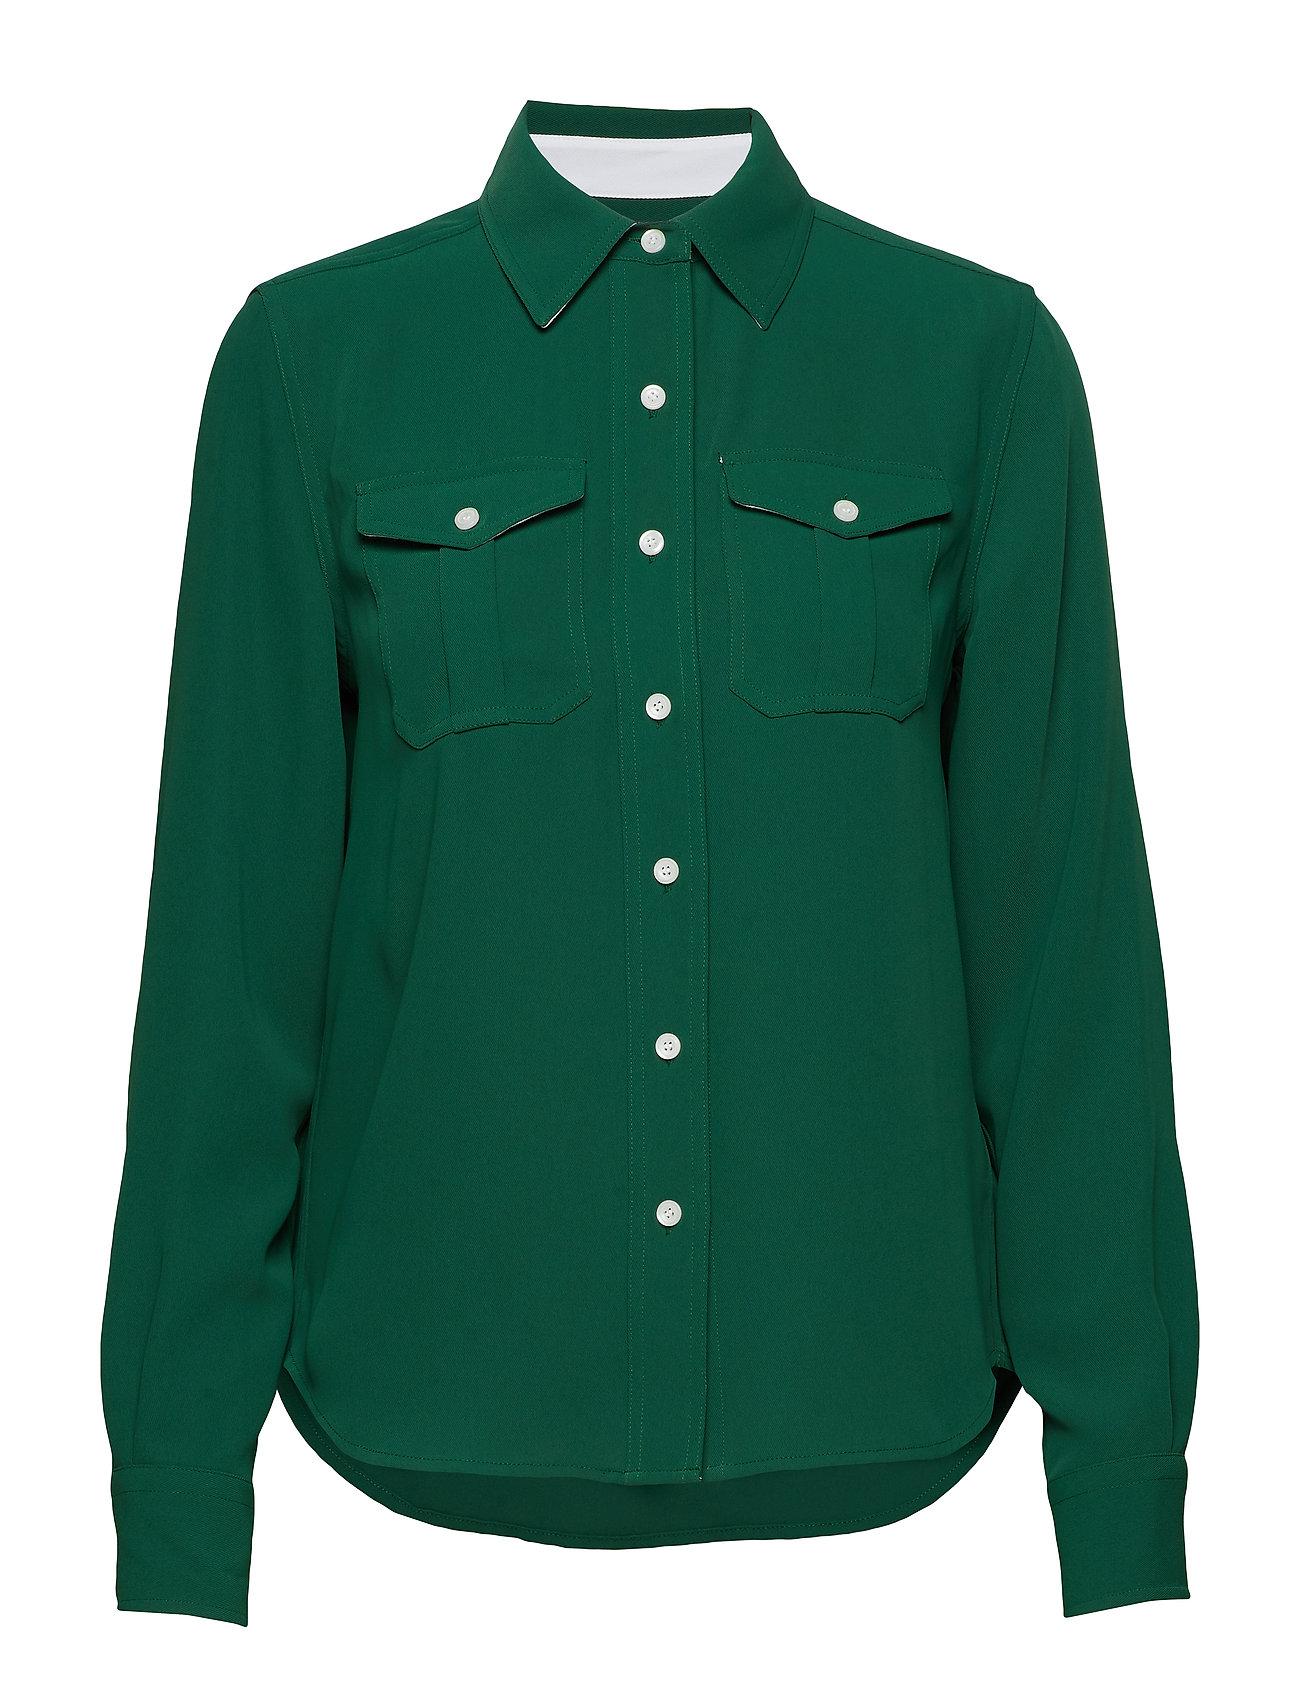 Calvin Klein POLICE PKT SHIRT LS - GREEN